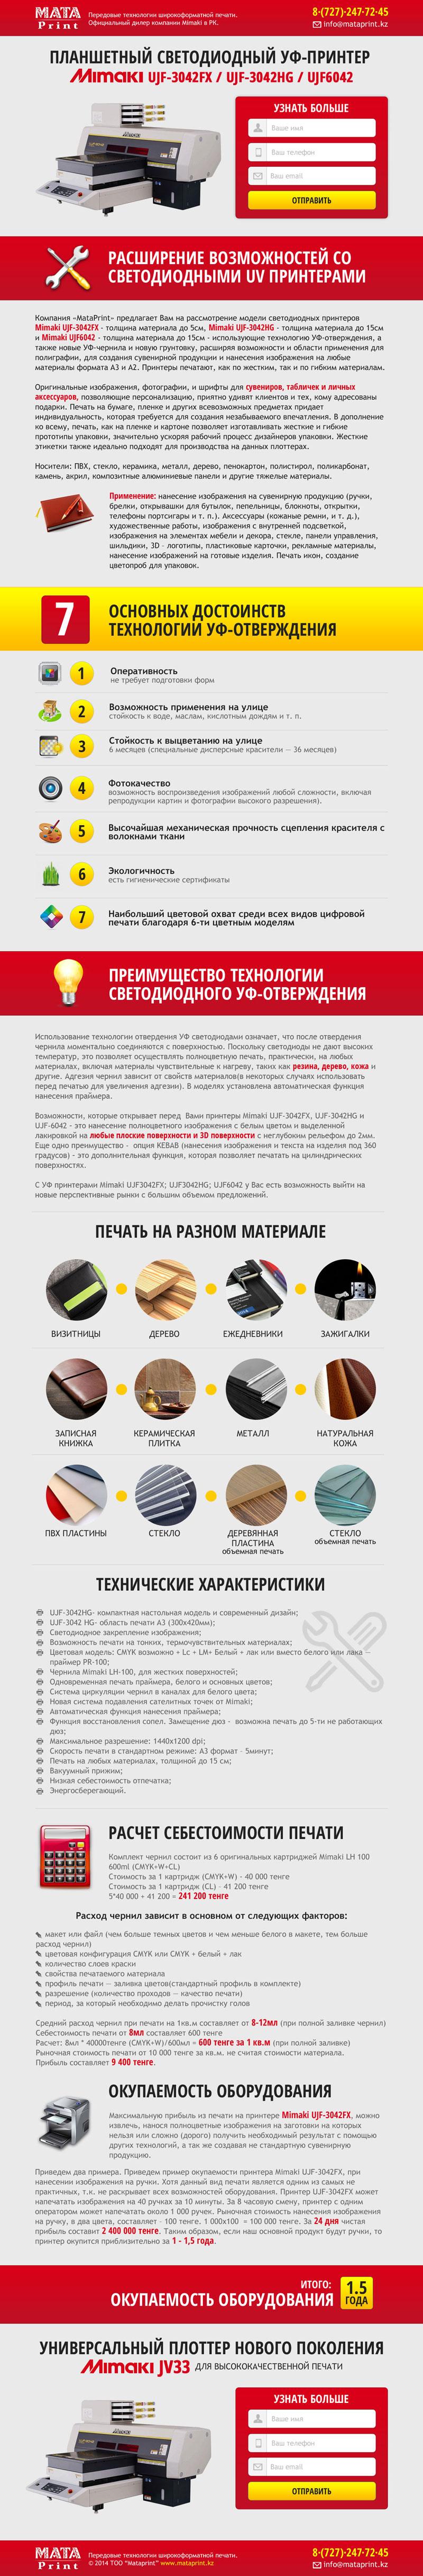 MataPrint: дизайн лендинга